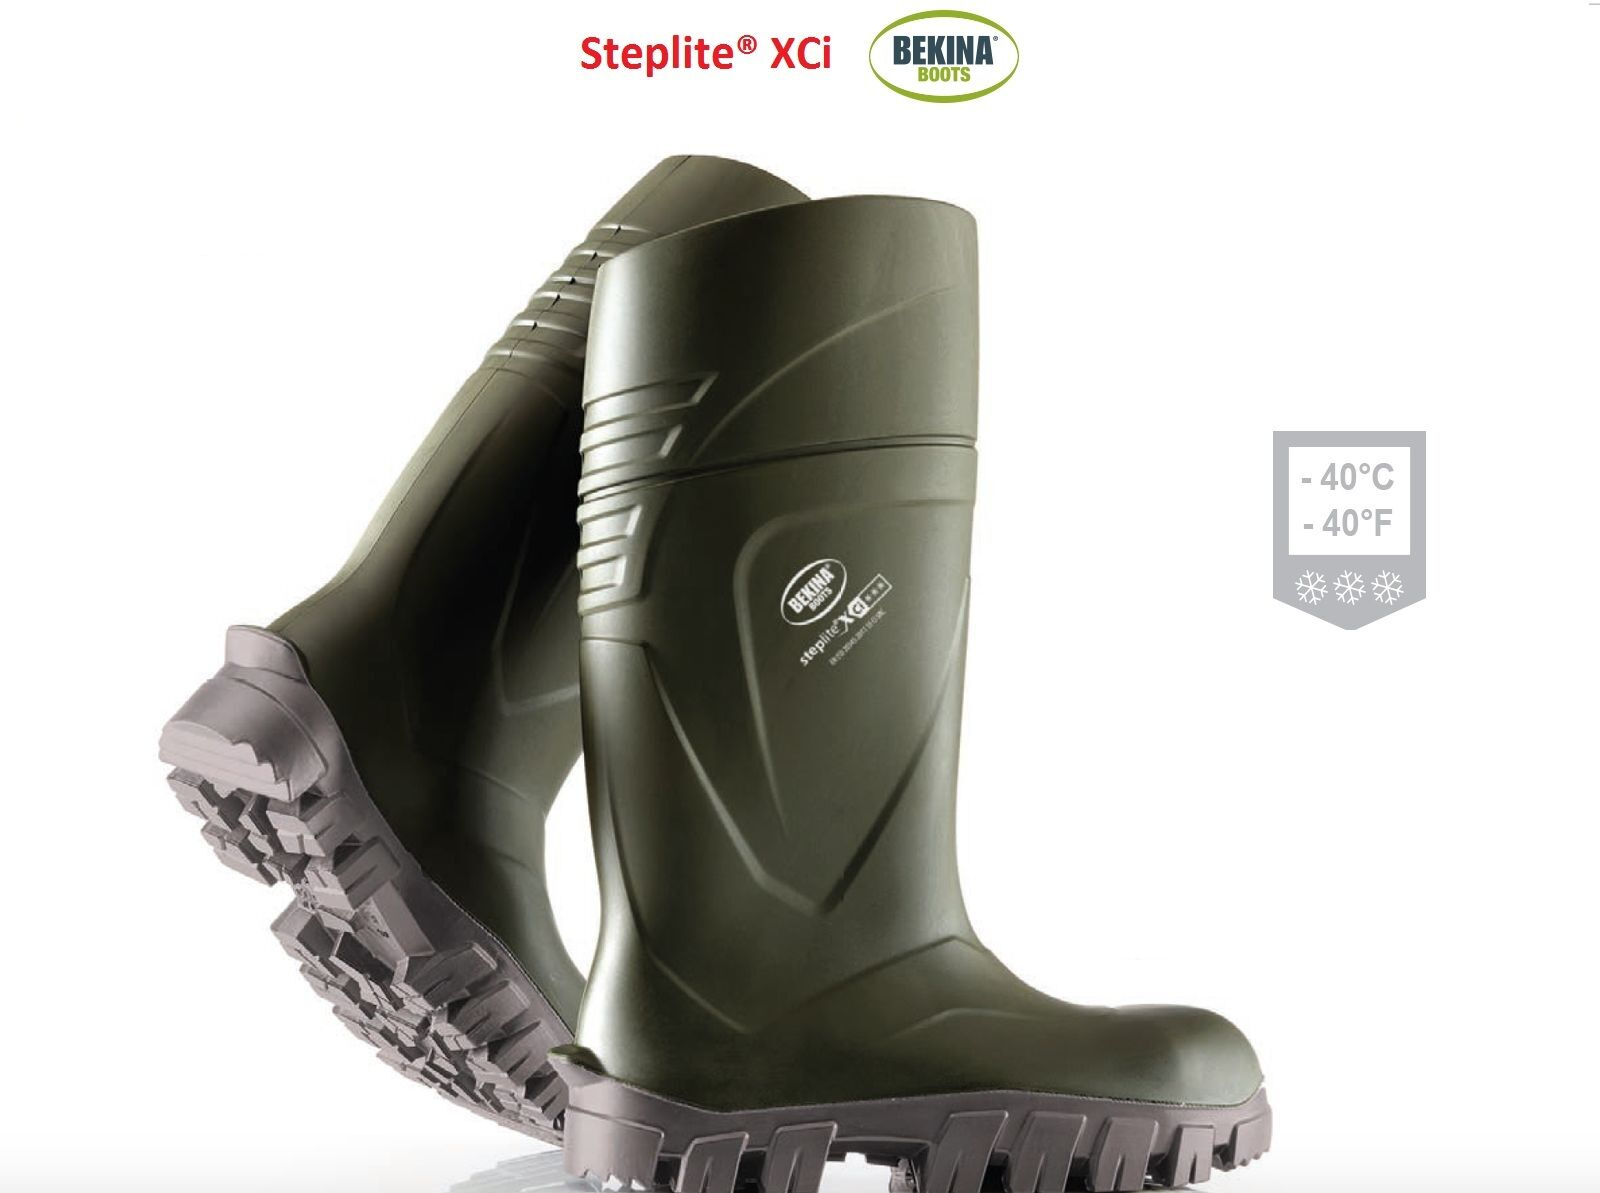 Bekina Steplite® XCI Wellies invernale Wellington Stivale invernale Wellies leggero b71757